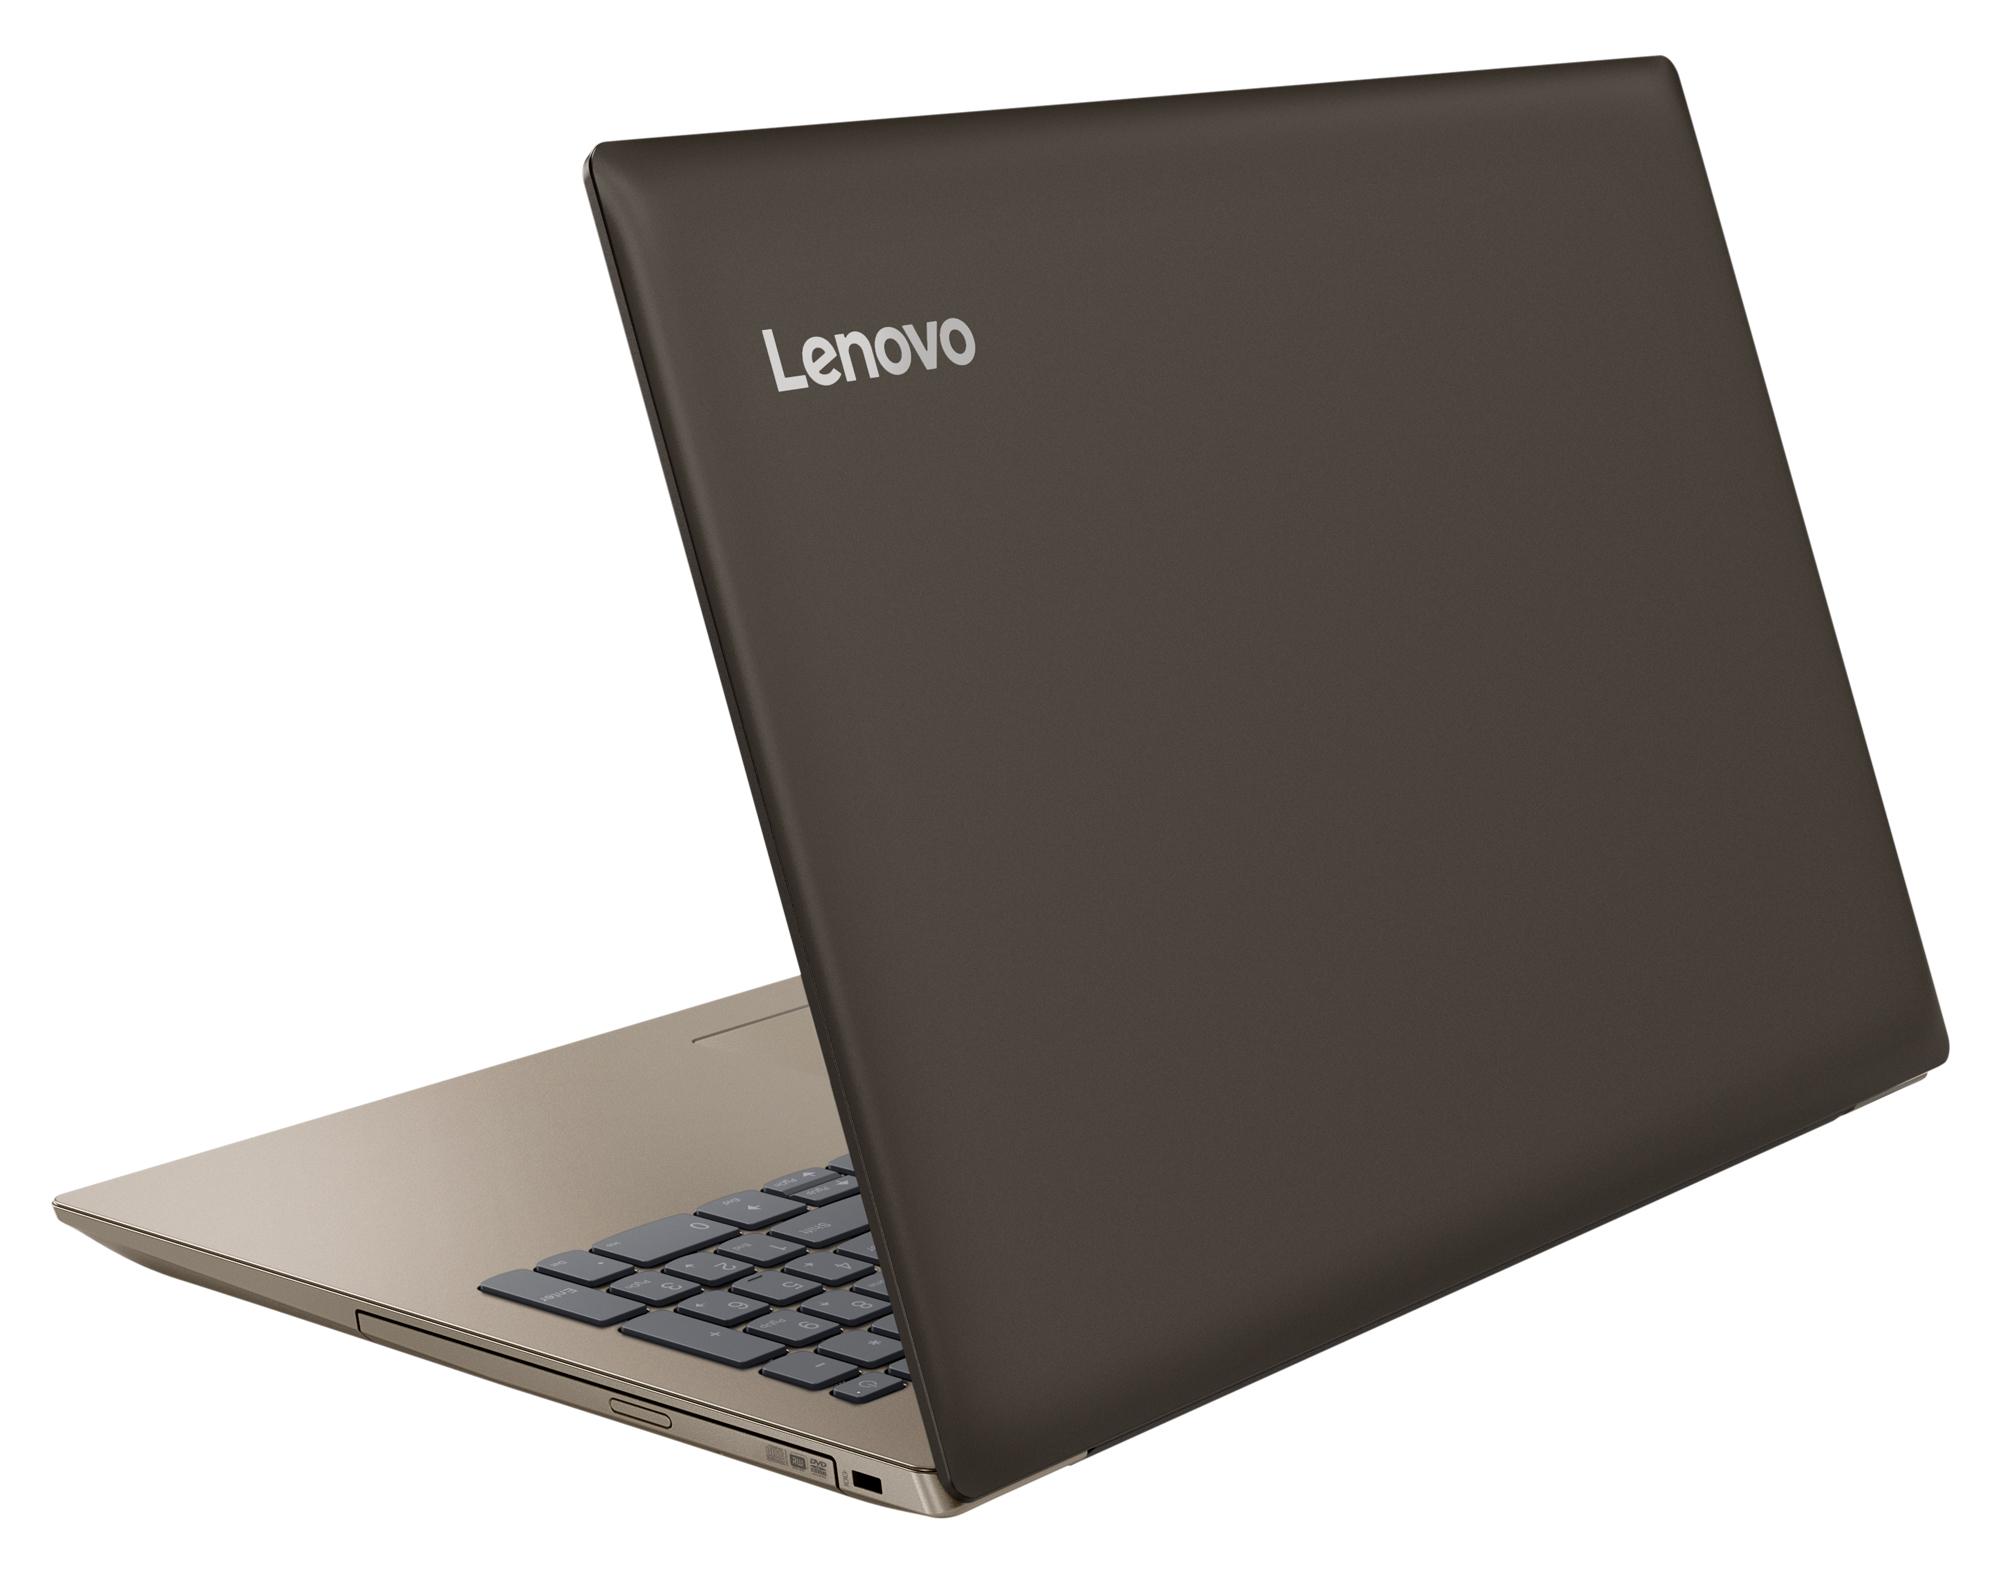 Фото  Ноутбук Lenovo ideapad 330-15 Chocolate (81DE01VXRA)